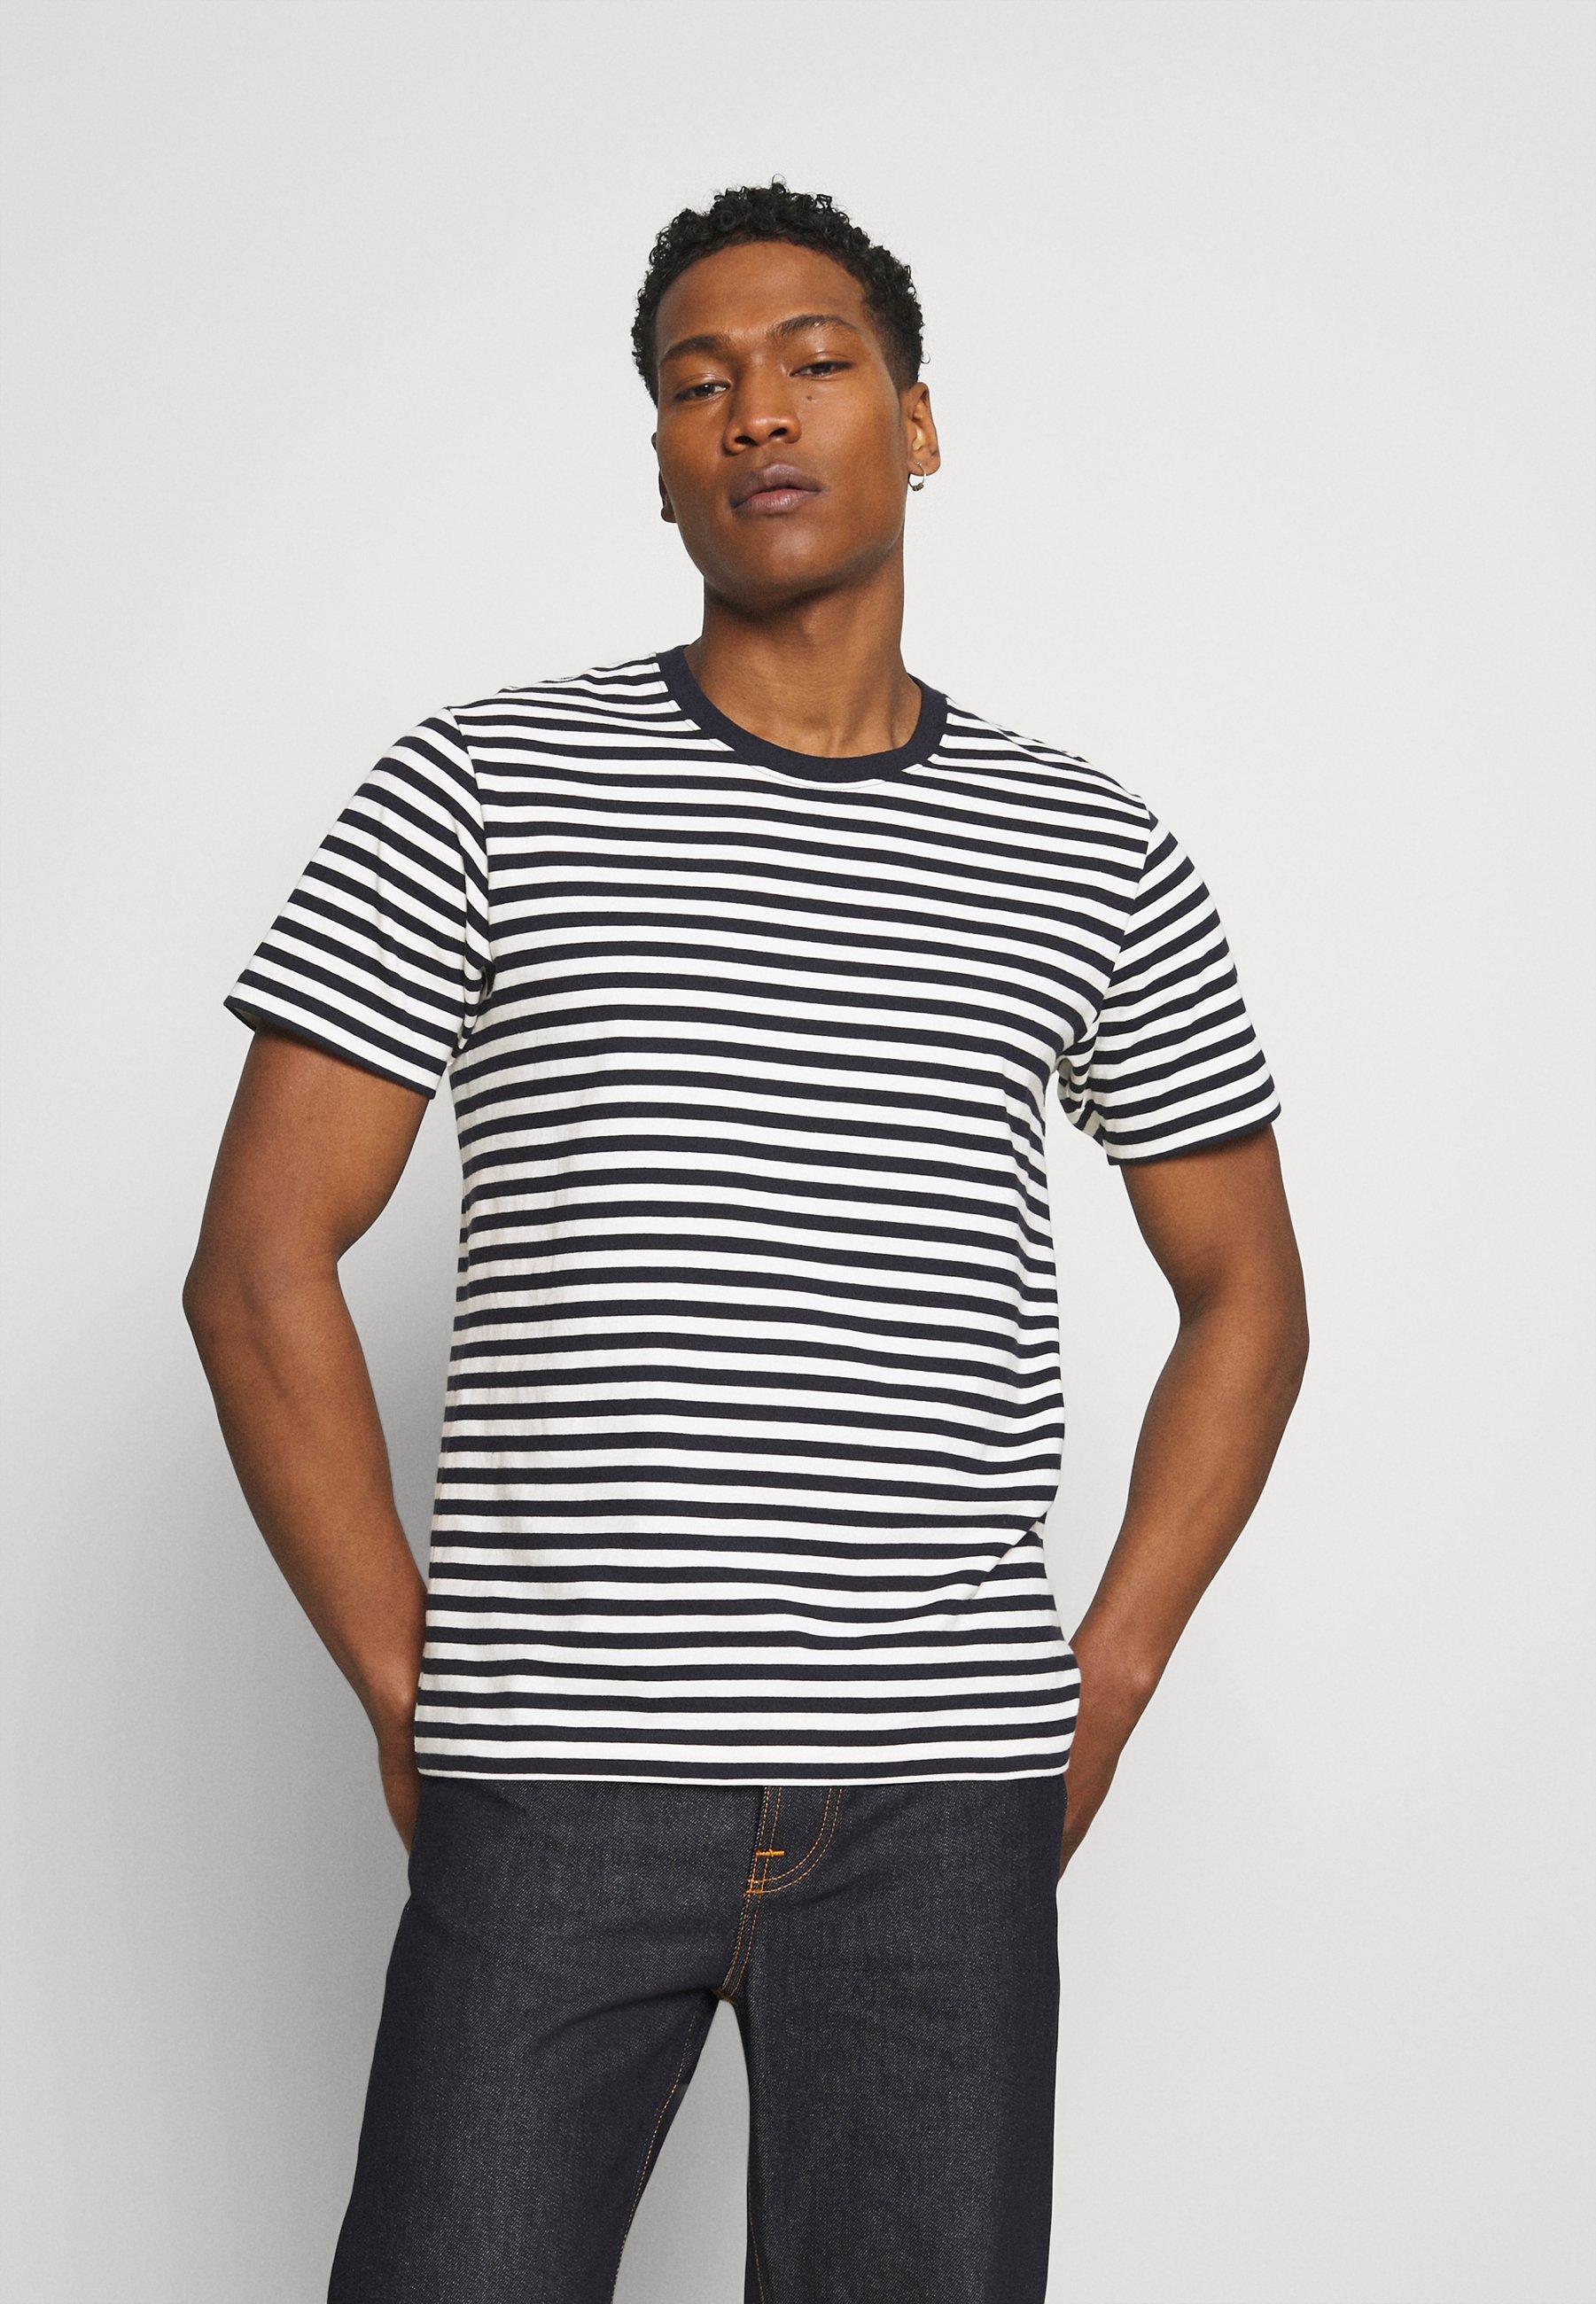 Homme T-shirt basique - navy